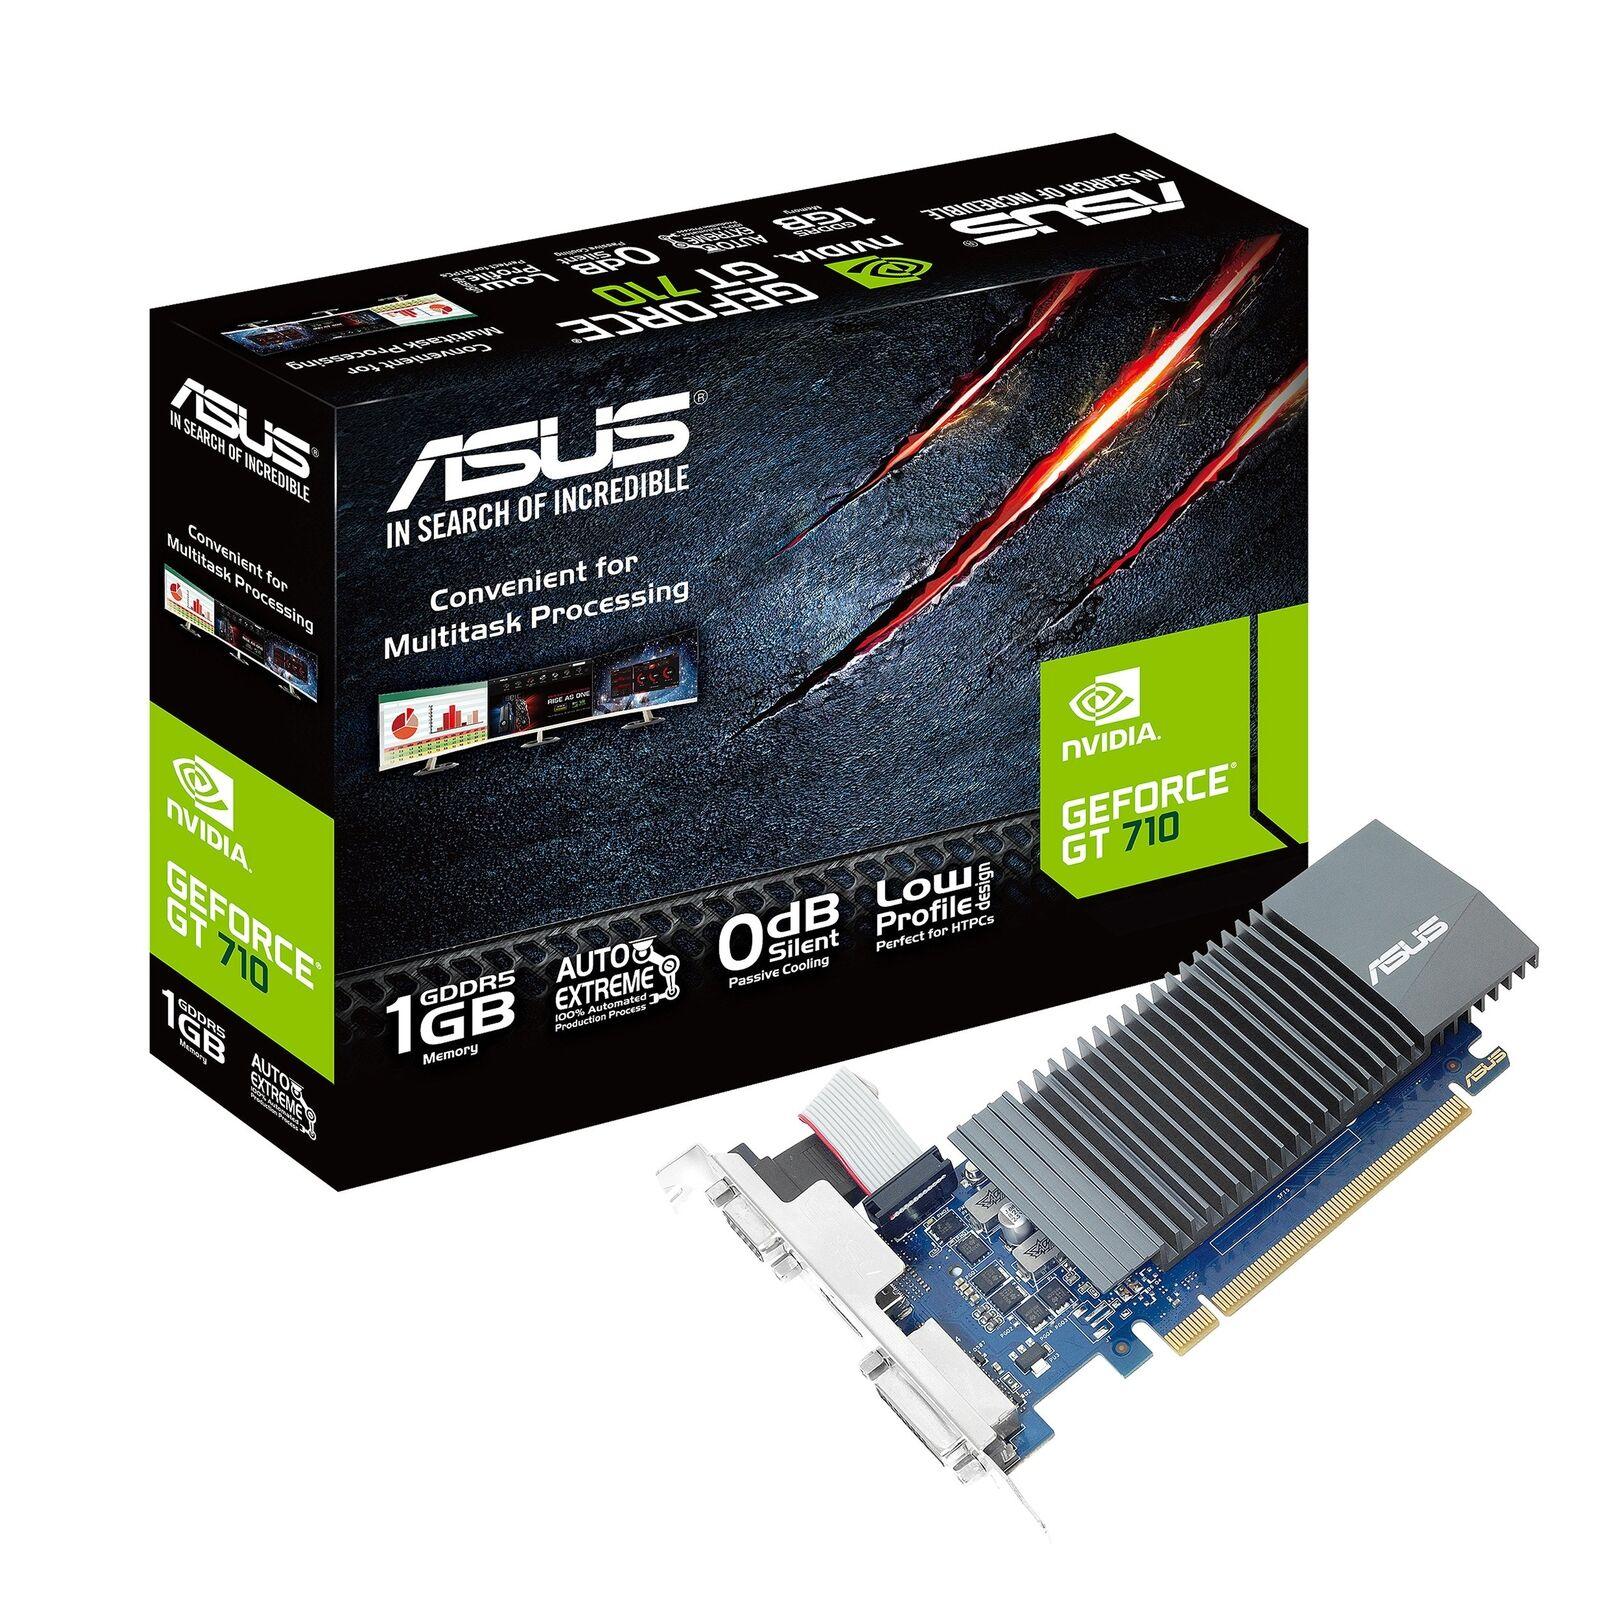 Asus GeForce GT 710 GT710-SL-1GD5 video card